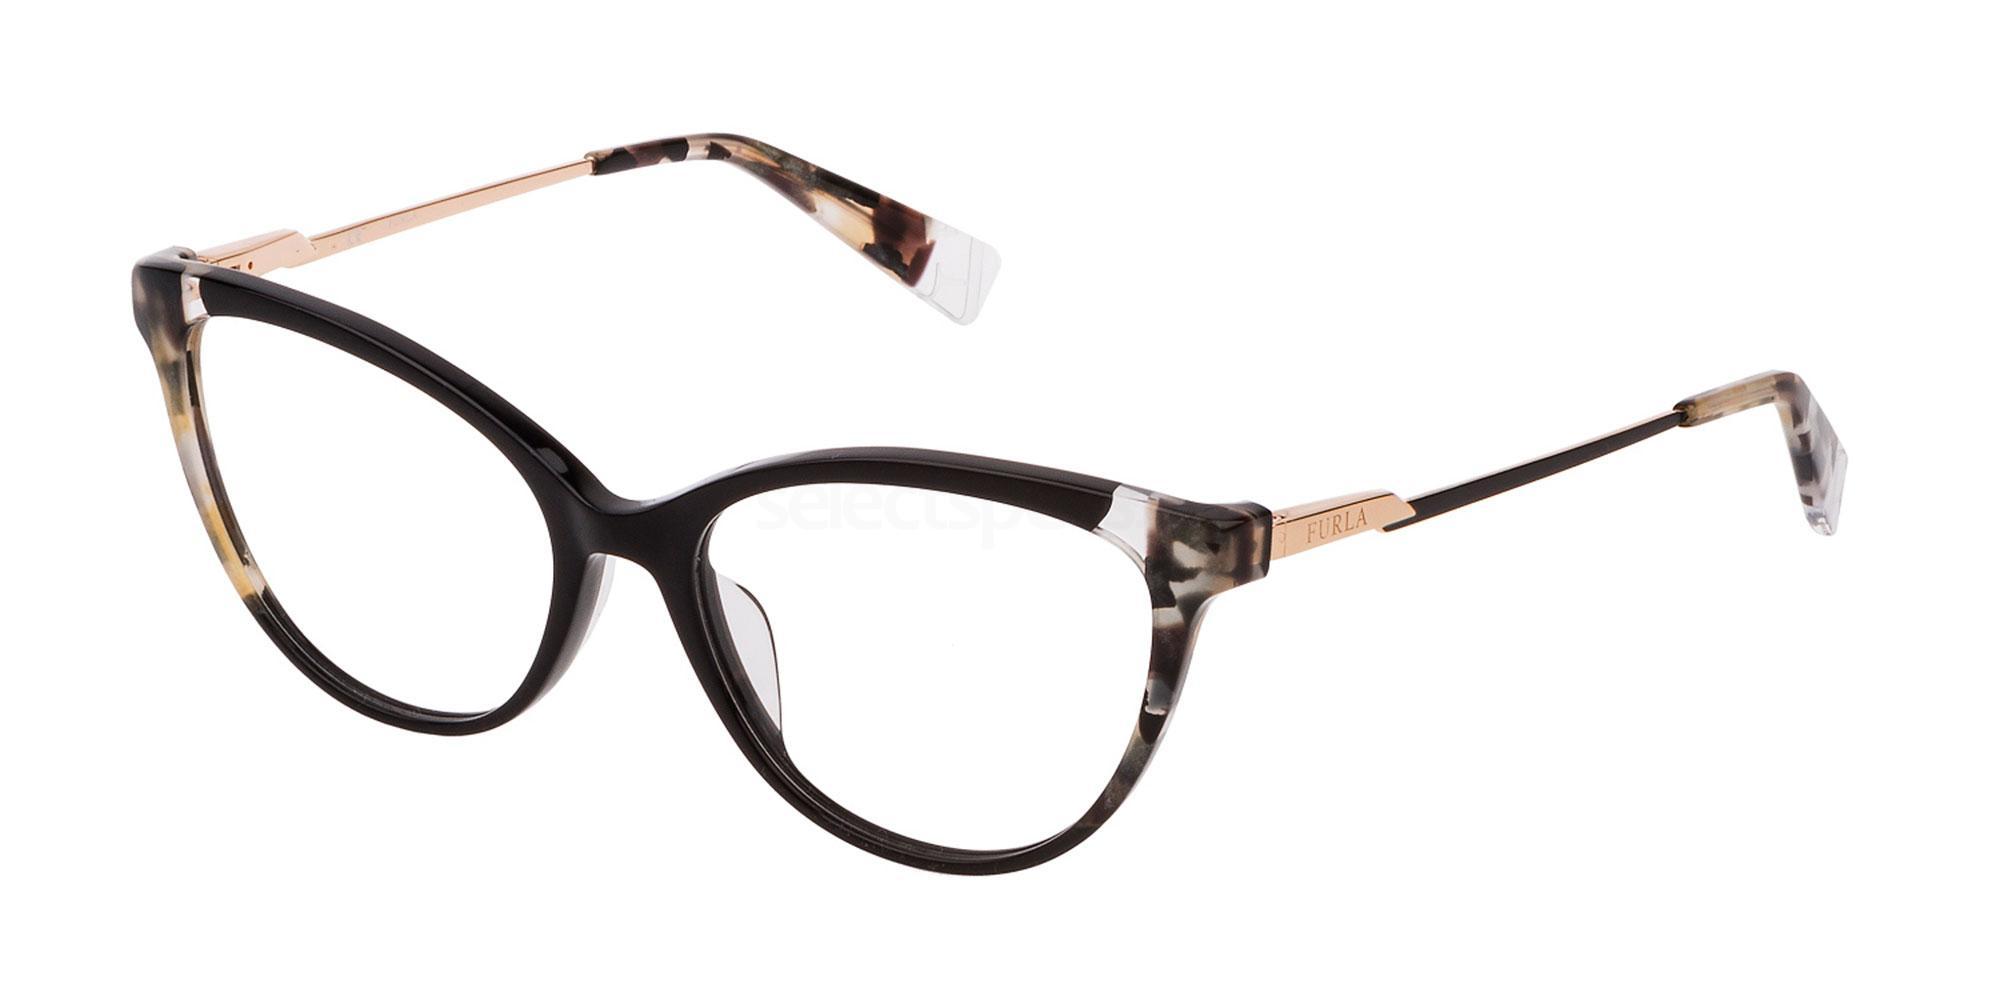 0700 VFU292 Glasses, Furla